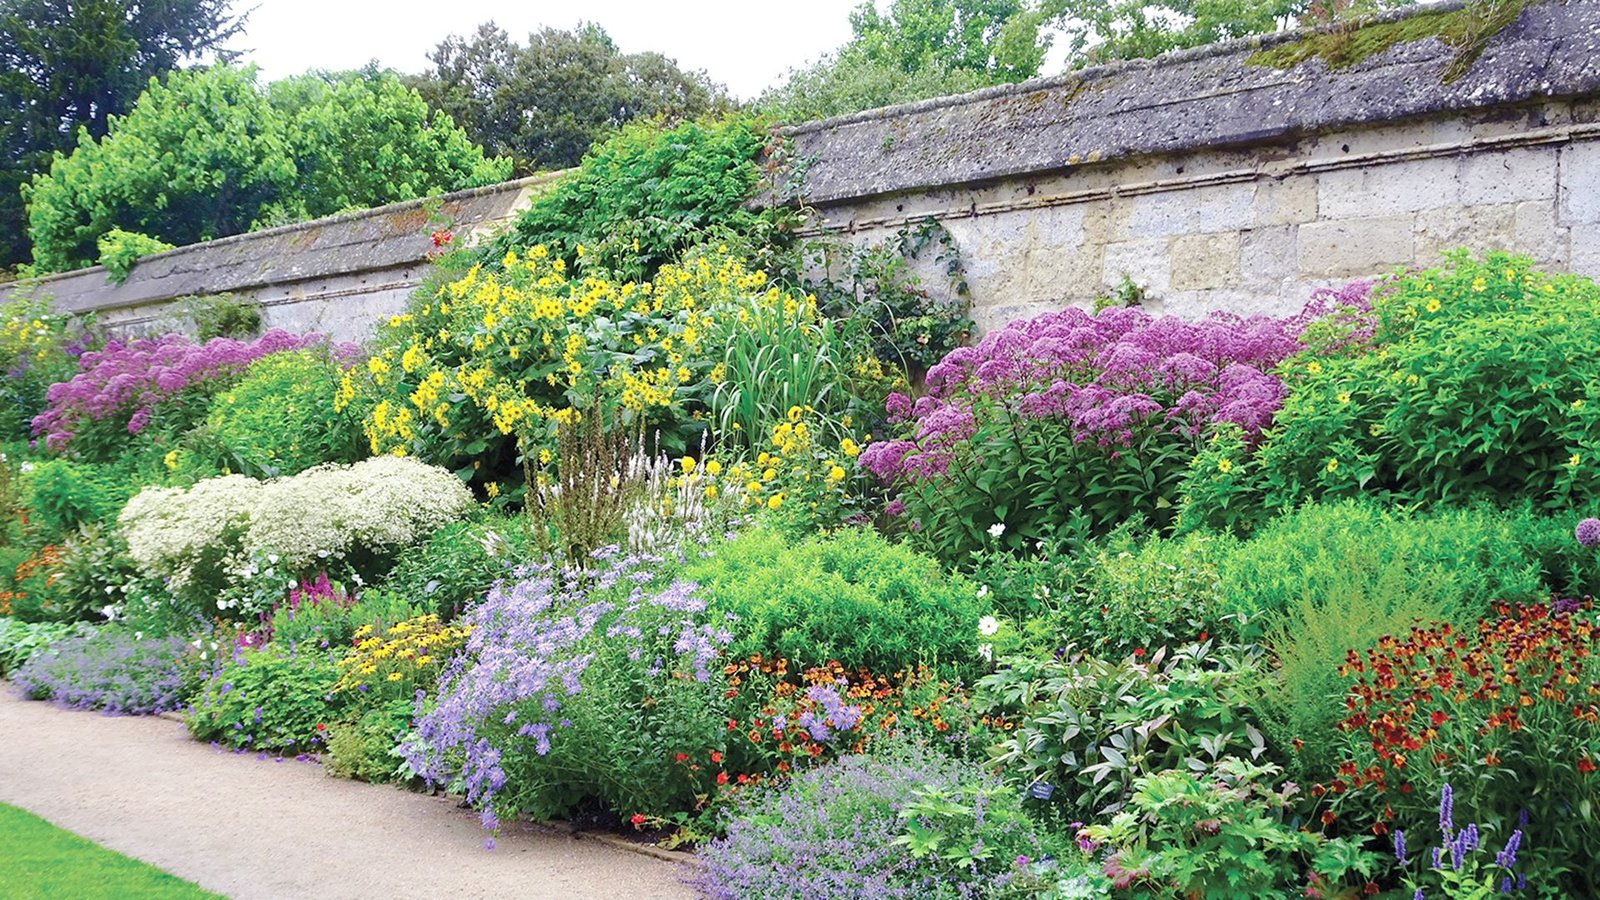 Britain's Estates and Gardens